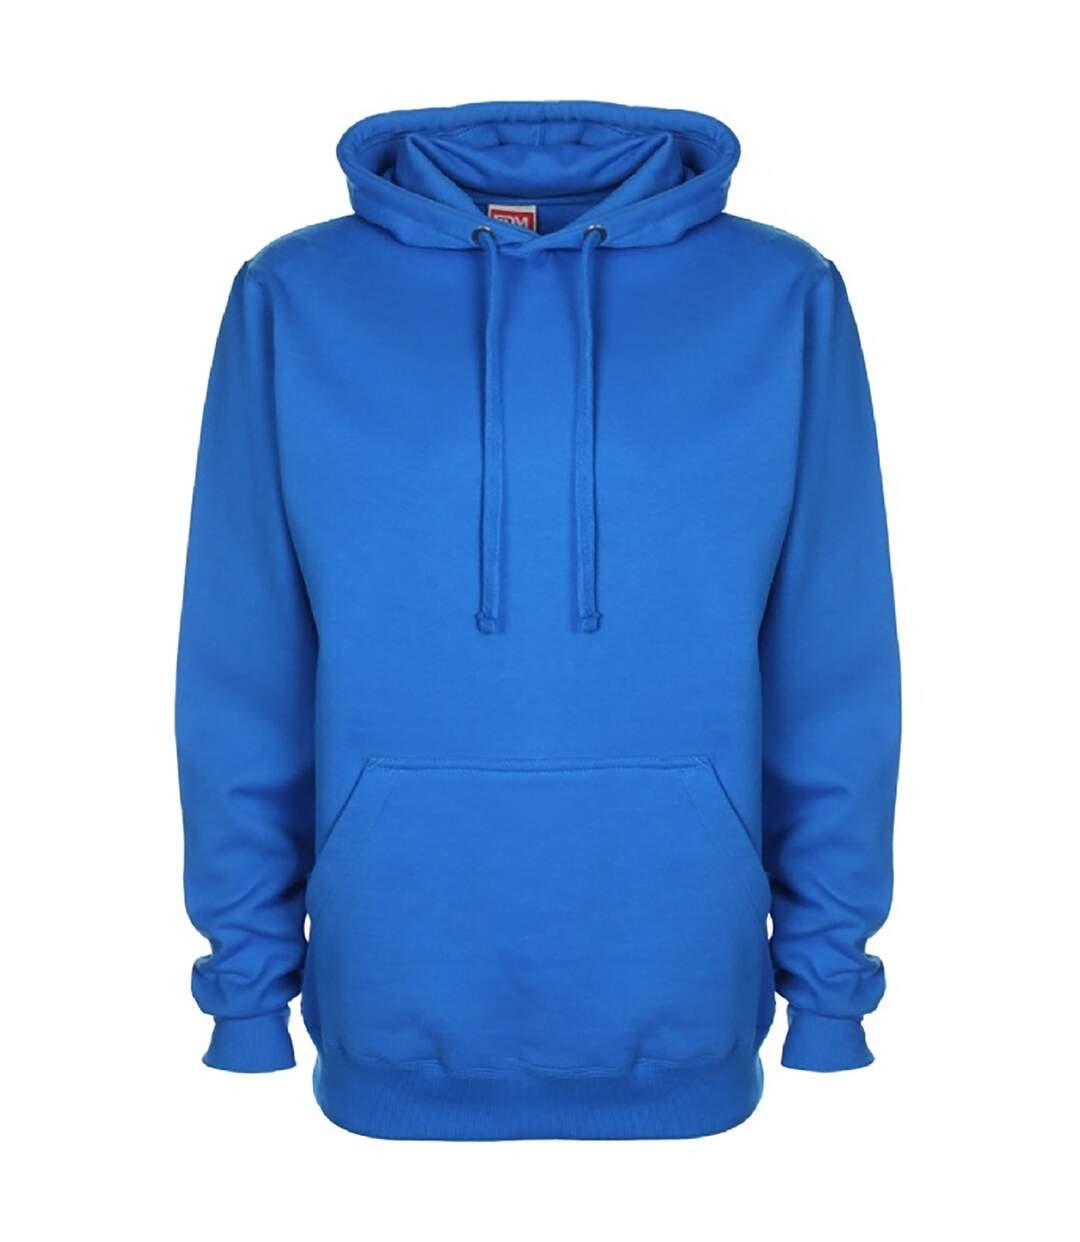 FDM Unisex Plain Original Hooded Sweatshirt / Hoodie (300 GSM) (Sapphire) - UTBC2024